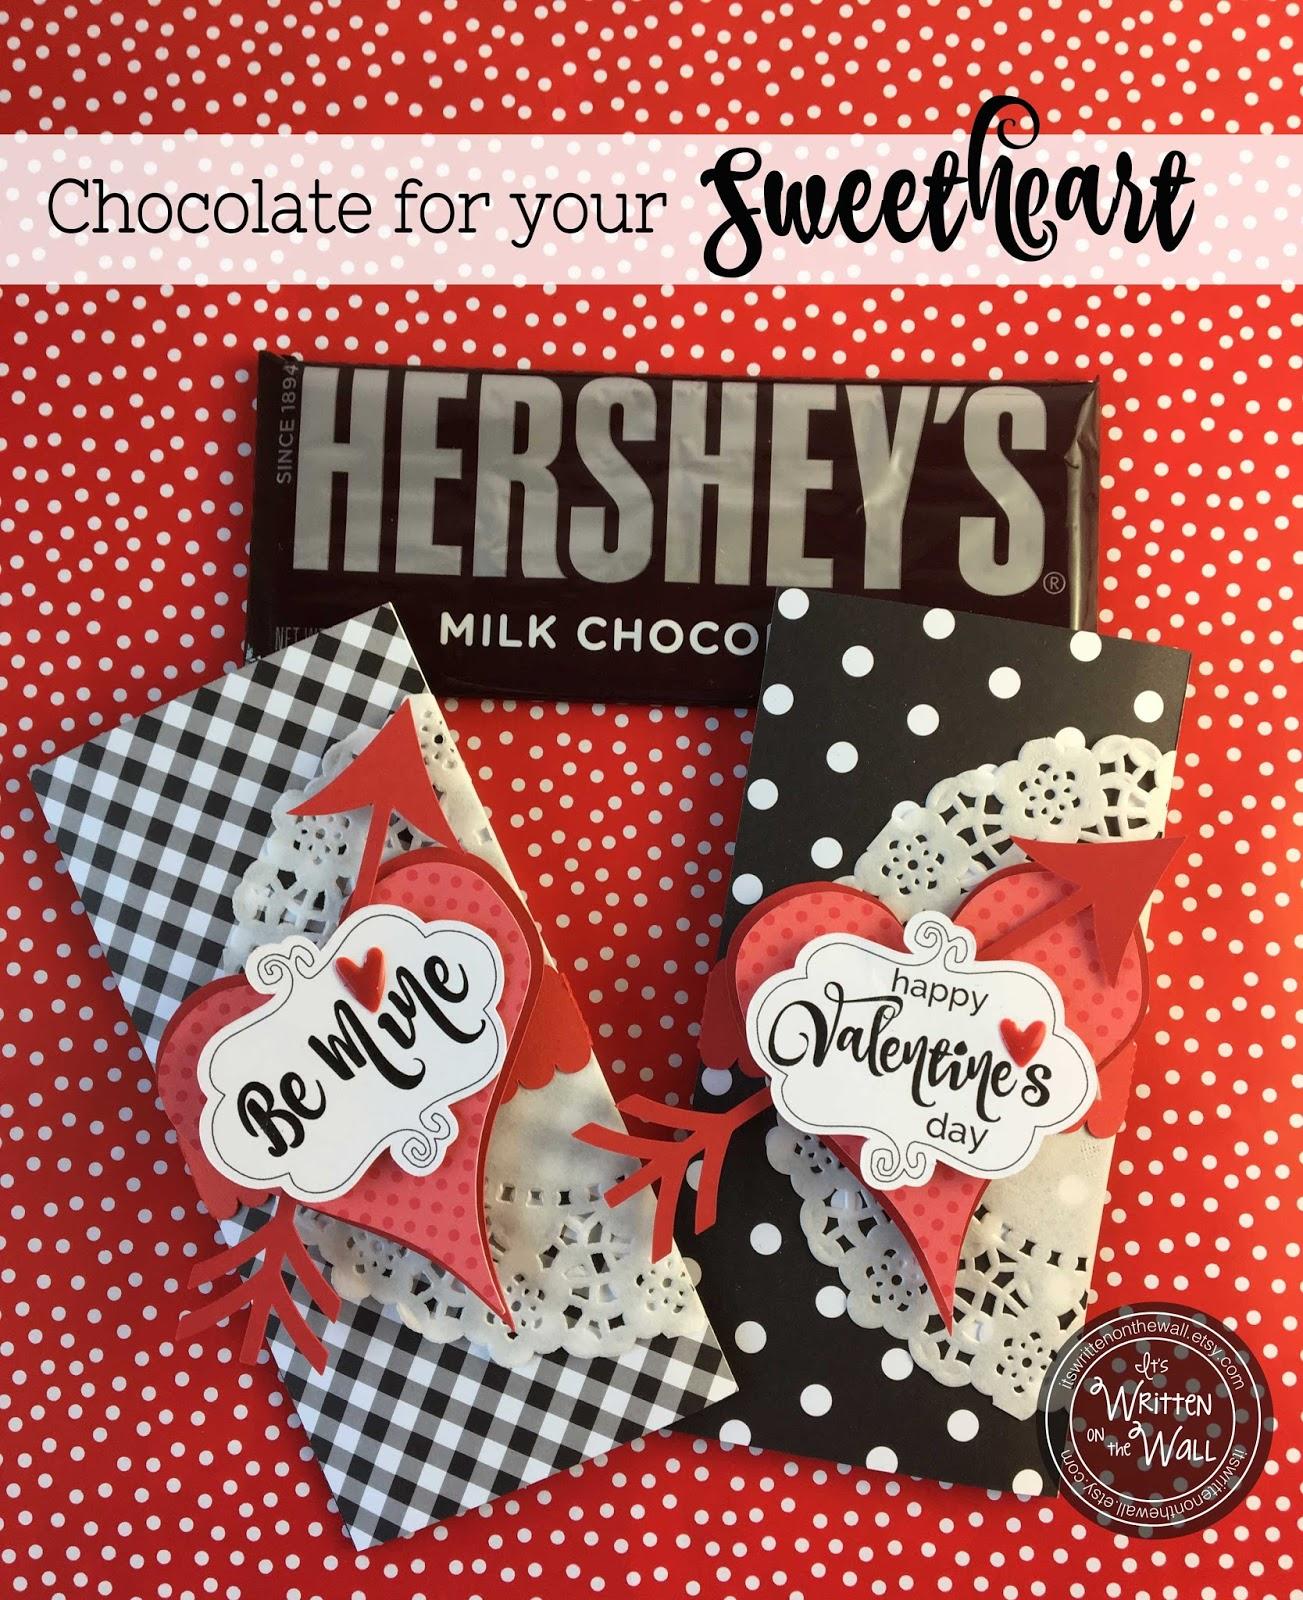 100 valentines day gifts for friends heart sugar scrub reci